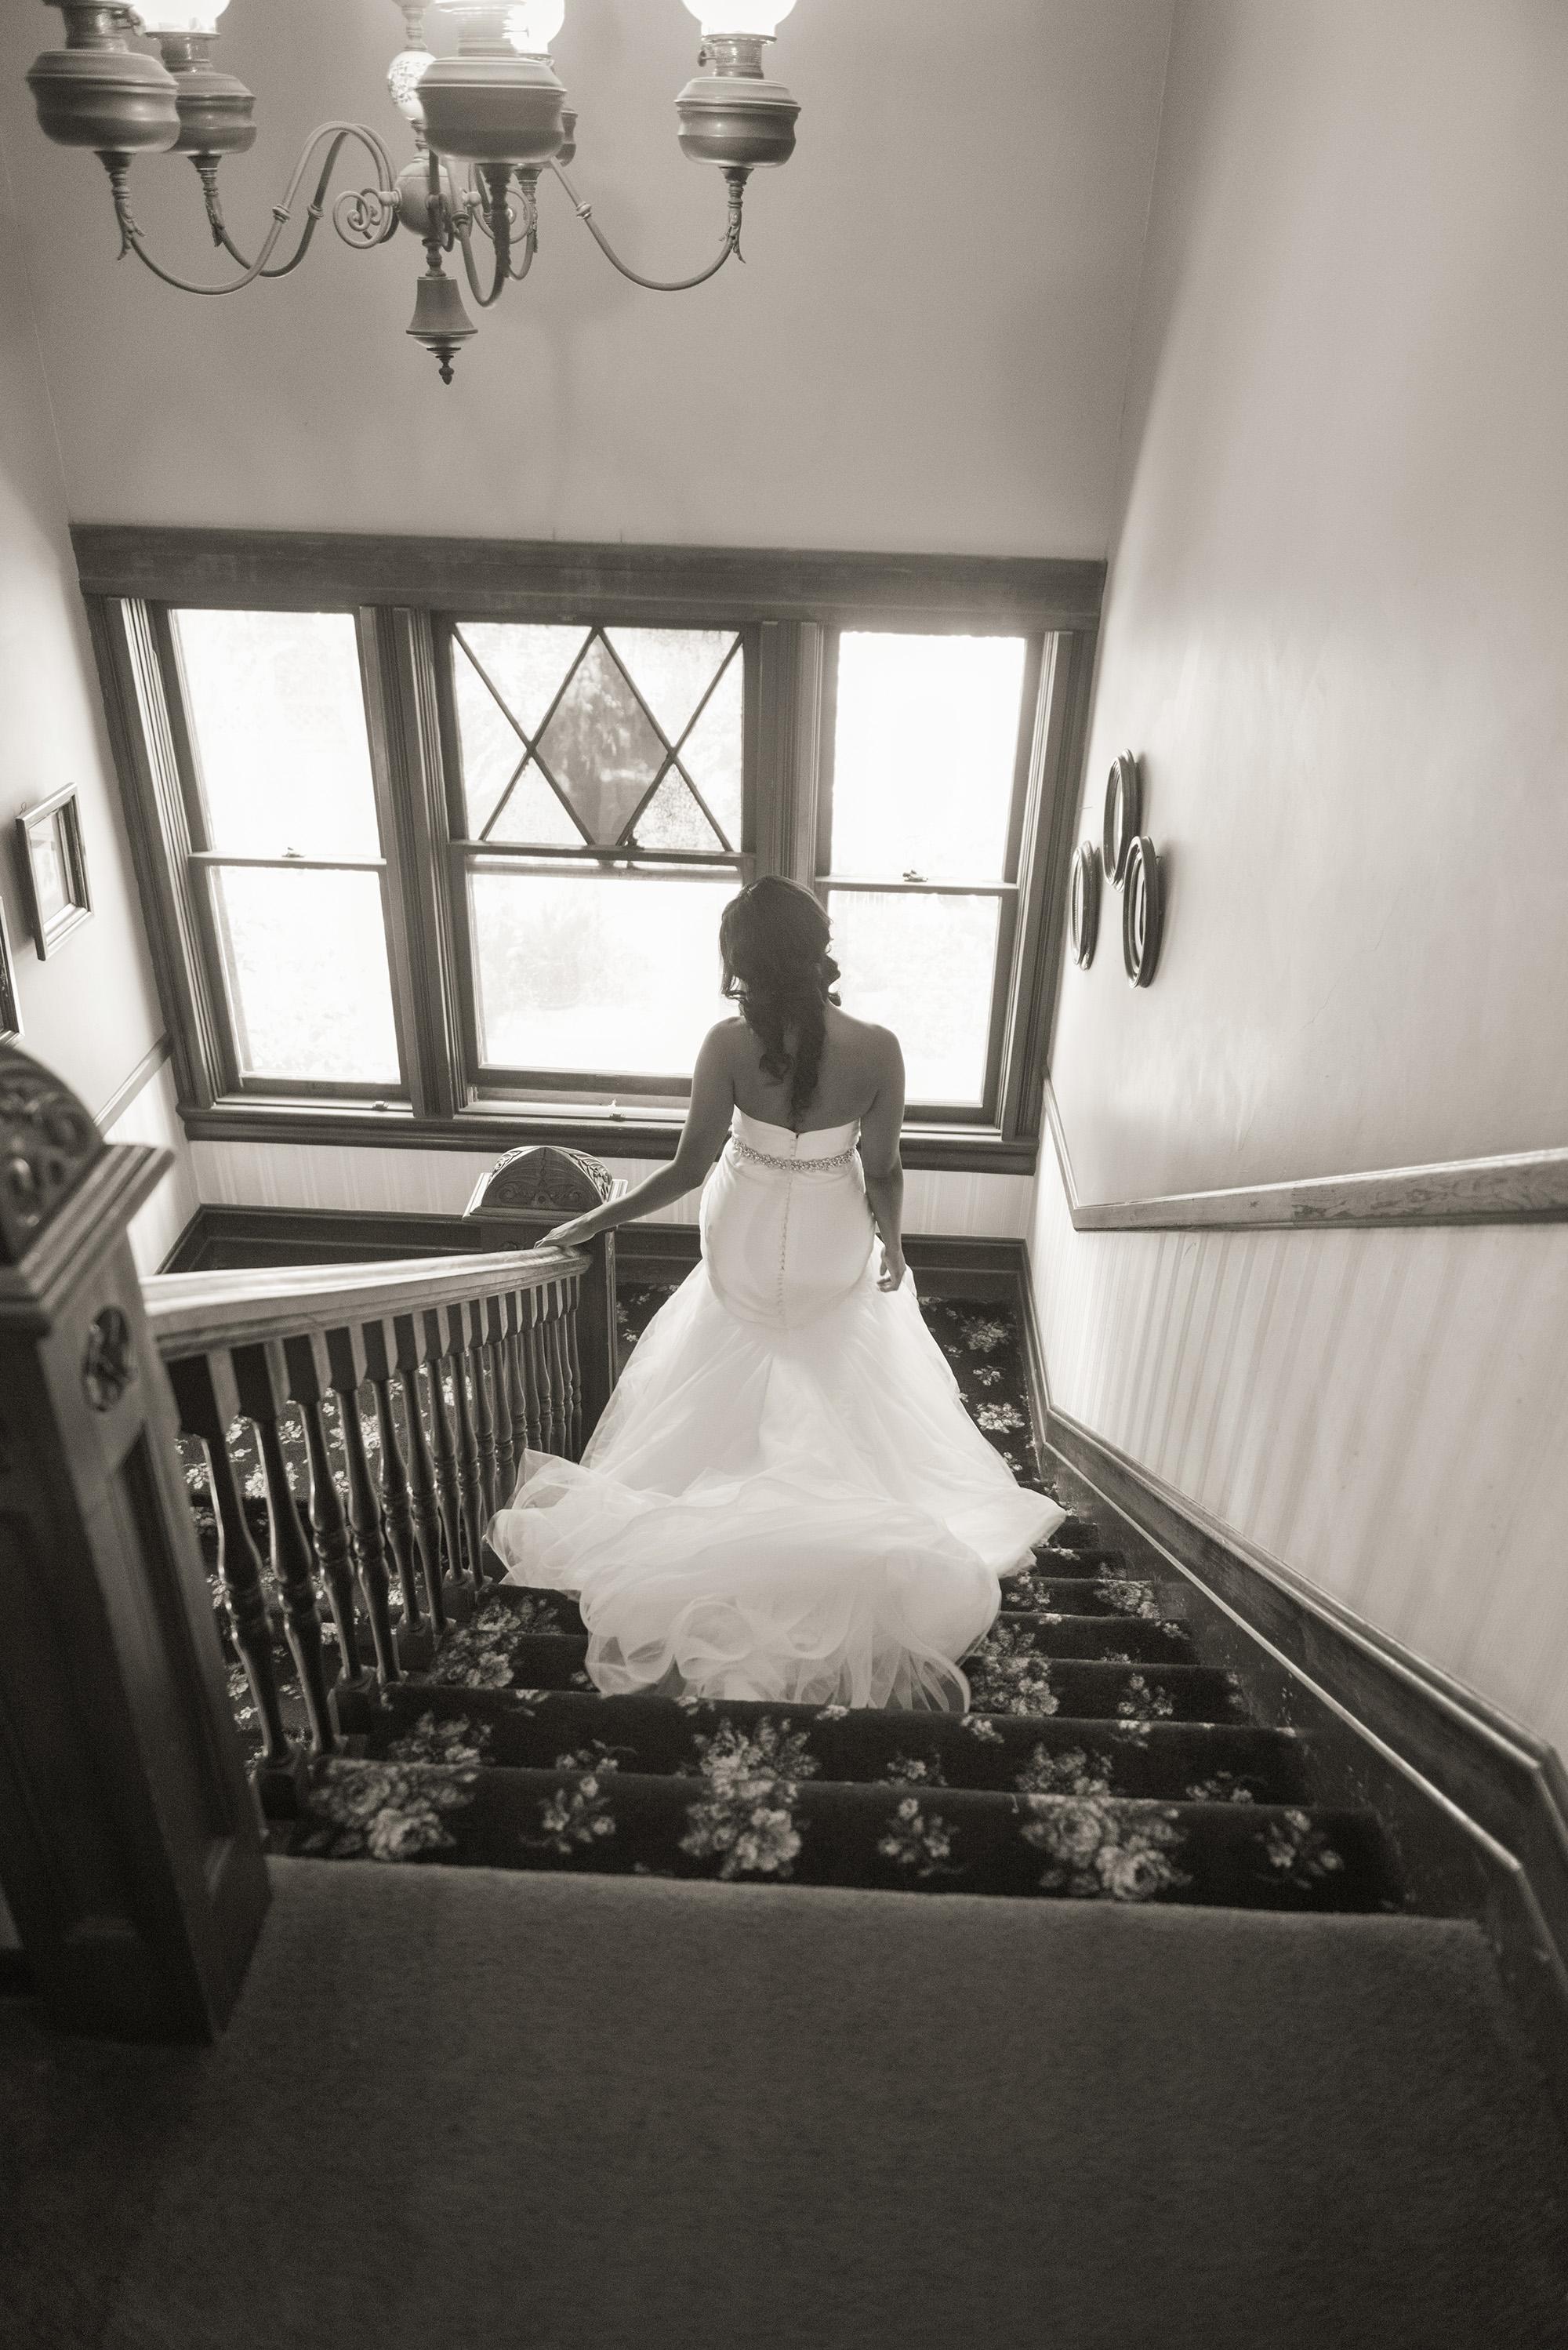 associate-photographer-christmas-house-wedding-carrie-vines-0086.jpg